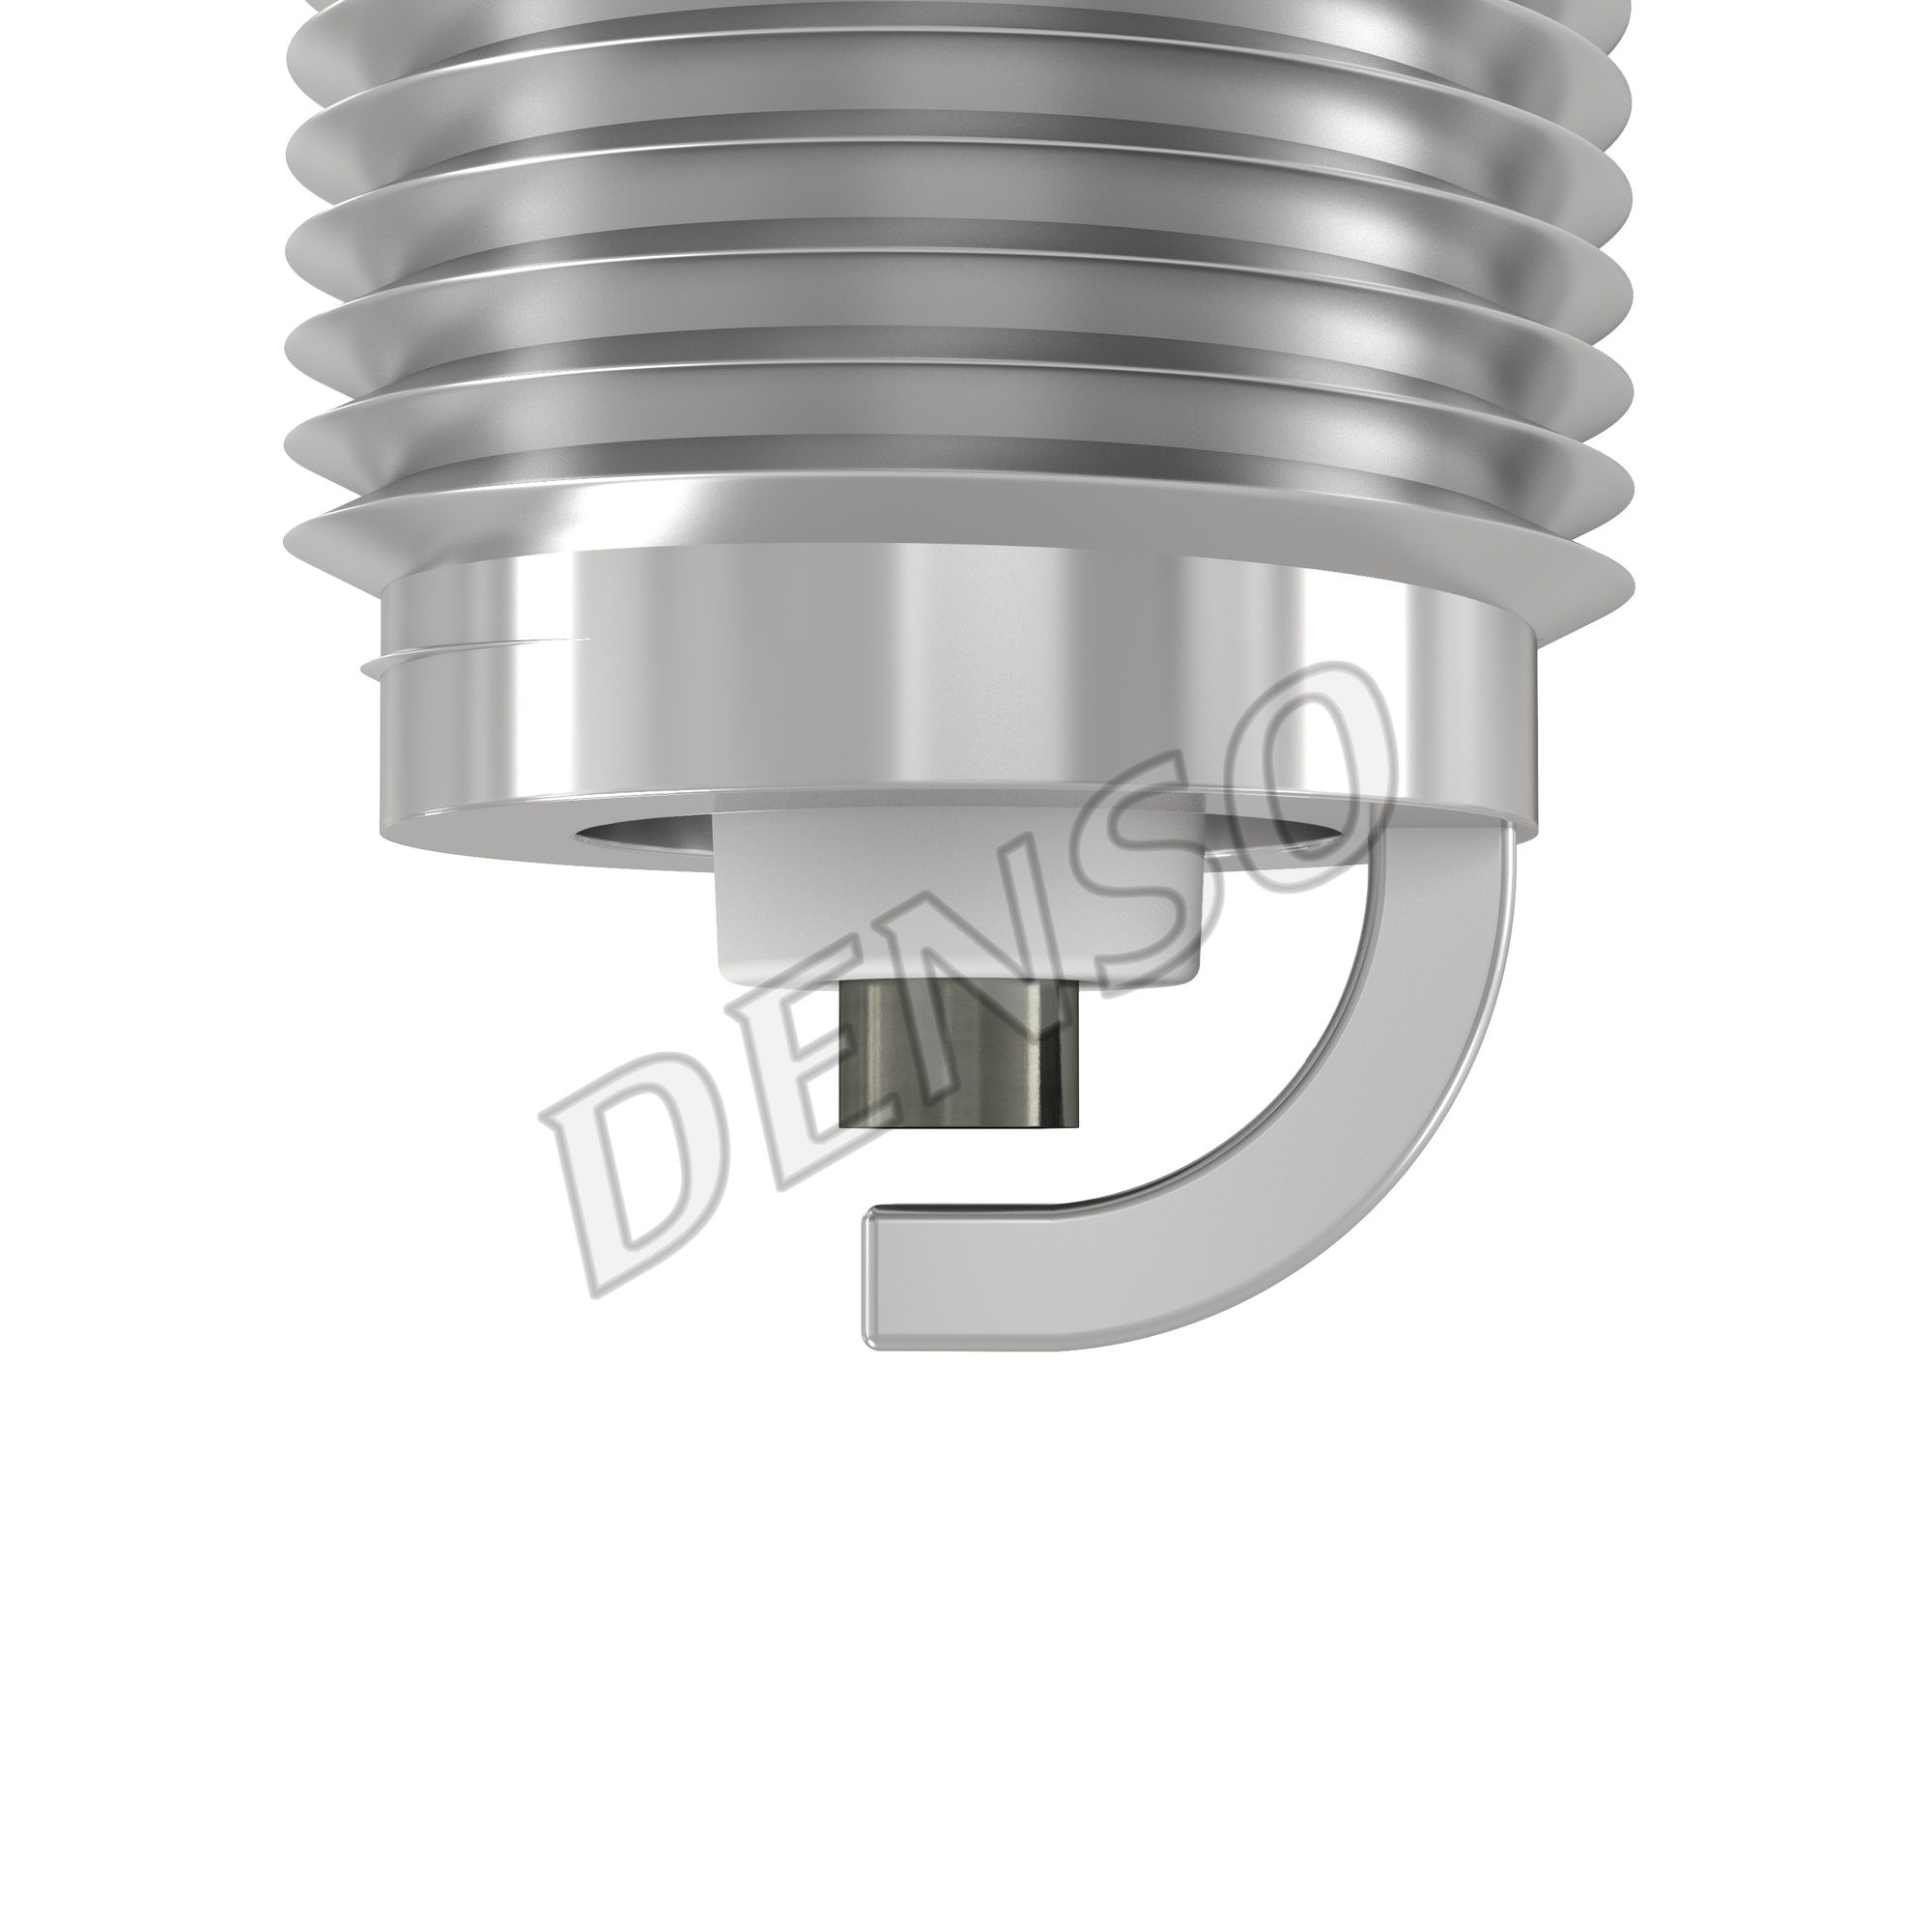 DENSO Nickel Tändstift N.vidd: 20.6 W20EPR-U BMW